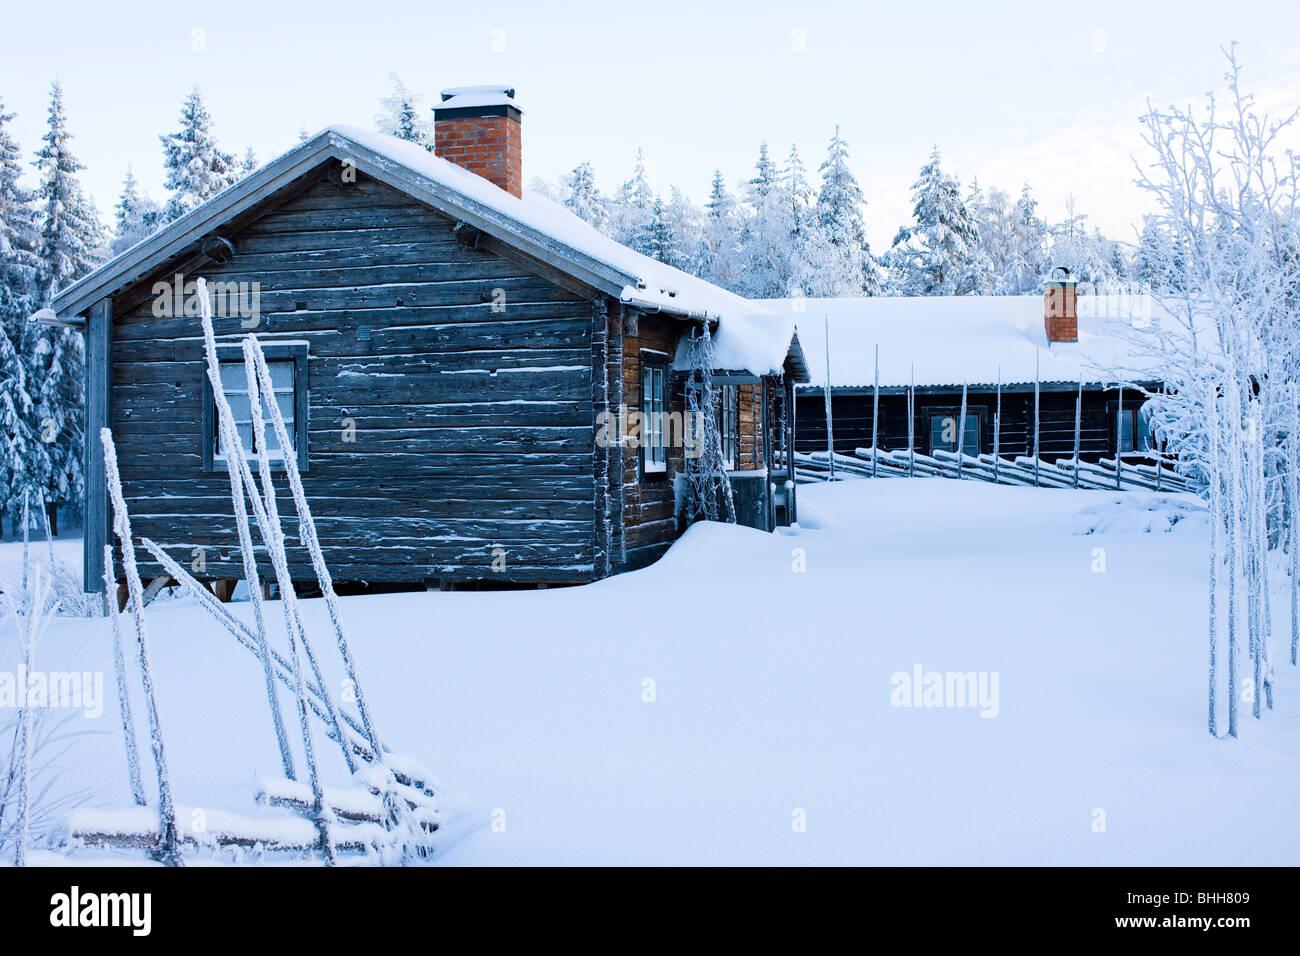 Hut in a wintry landscape, Sweden. - Stock Image